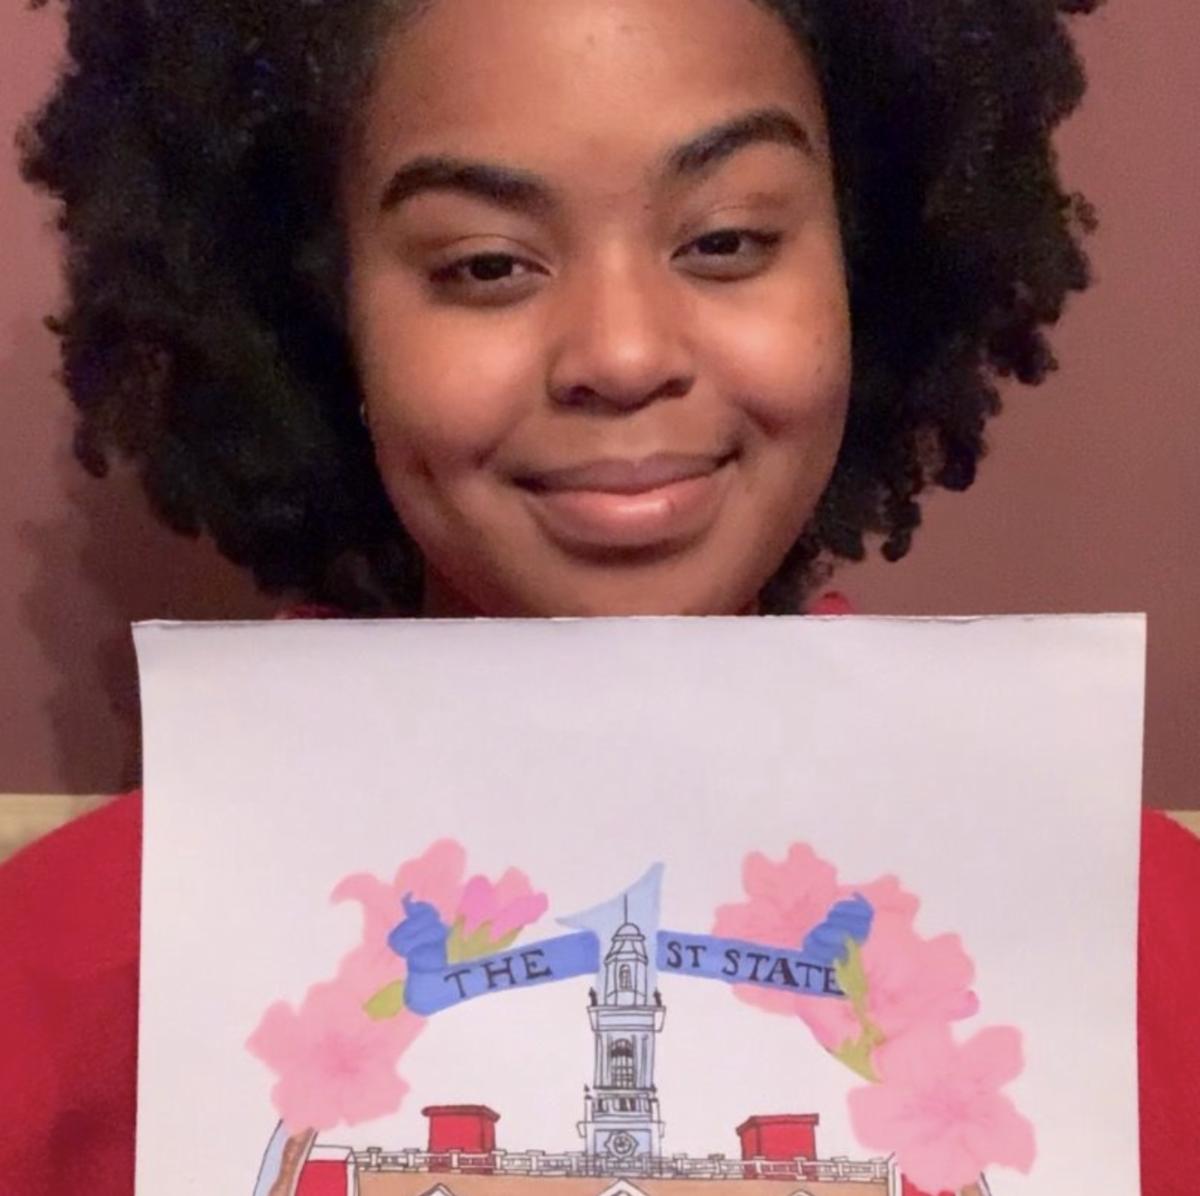 Newark High School Student - Hope McElveen - Christmas Ornament